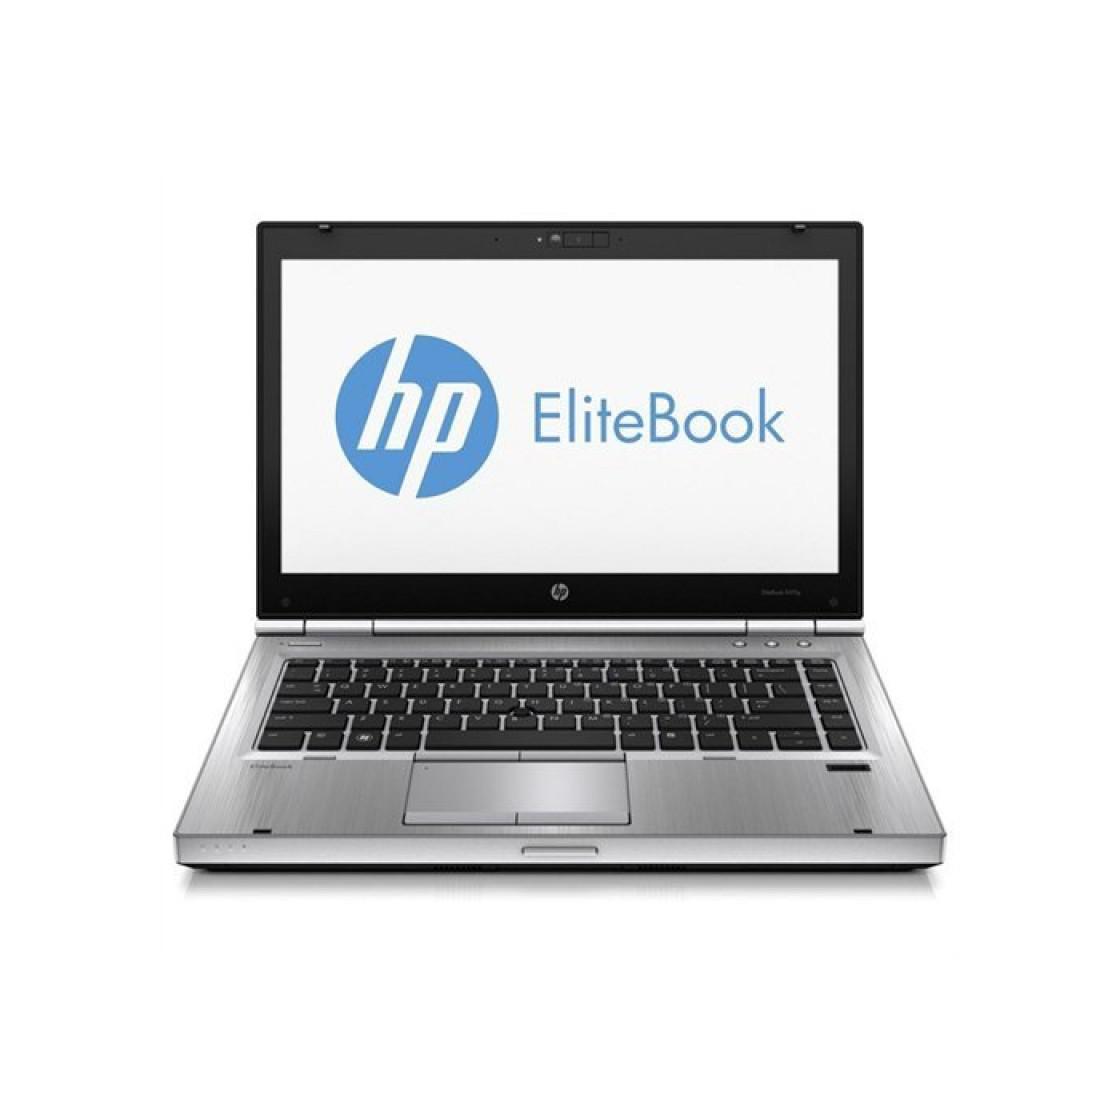 HP EliteBook 8470P 14-inch (2012) - Core i5-3210M - 8GB - SSD 250 GB AZERTY - French